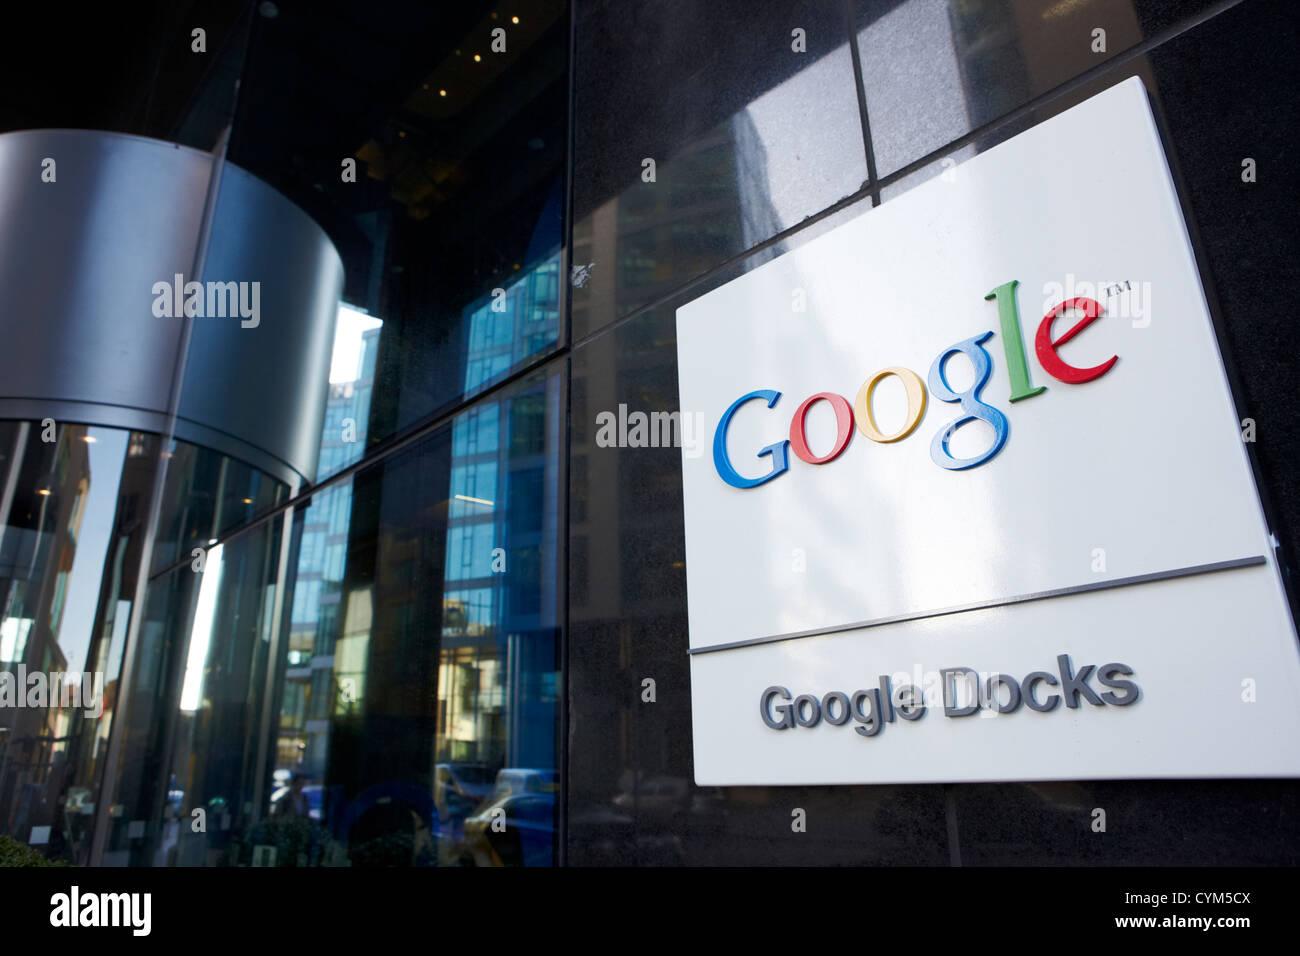 google emea eu hq offices google docks dublin republic of ireland - Stock Image